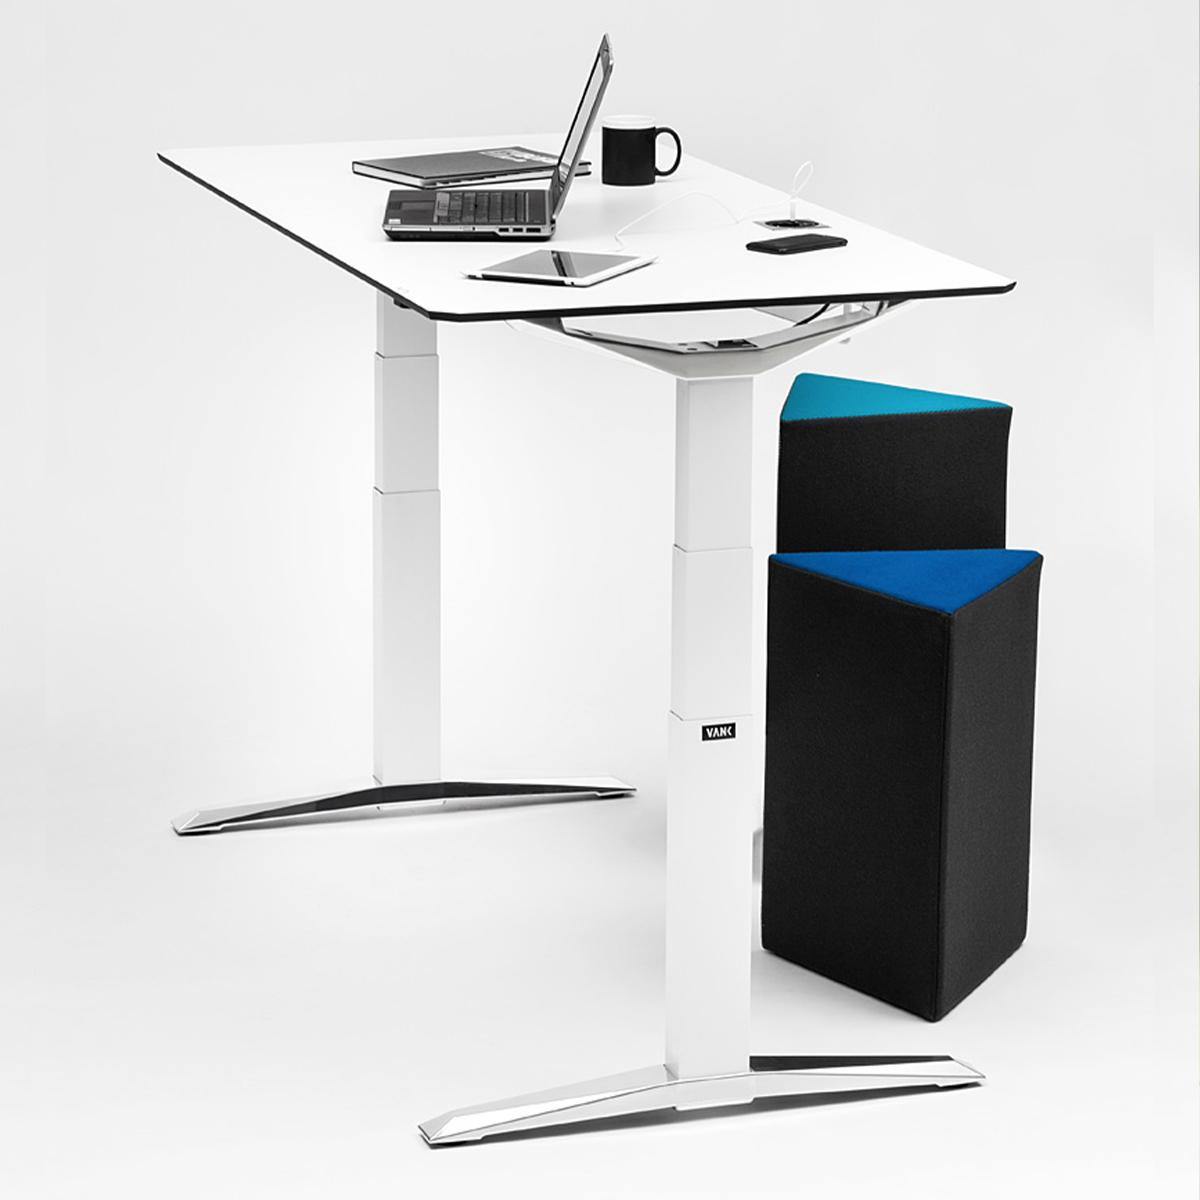 biurko regulowane elektrycznie VANK_MOVE HSR